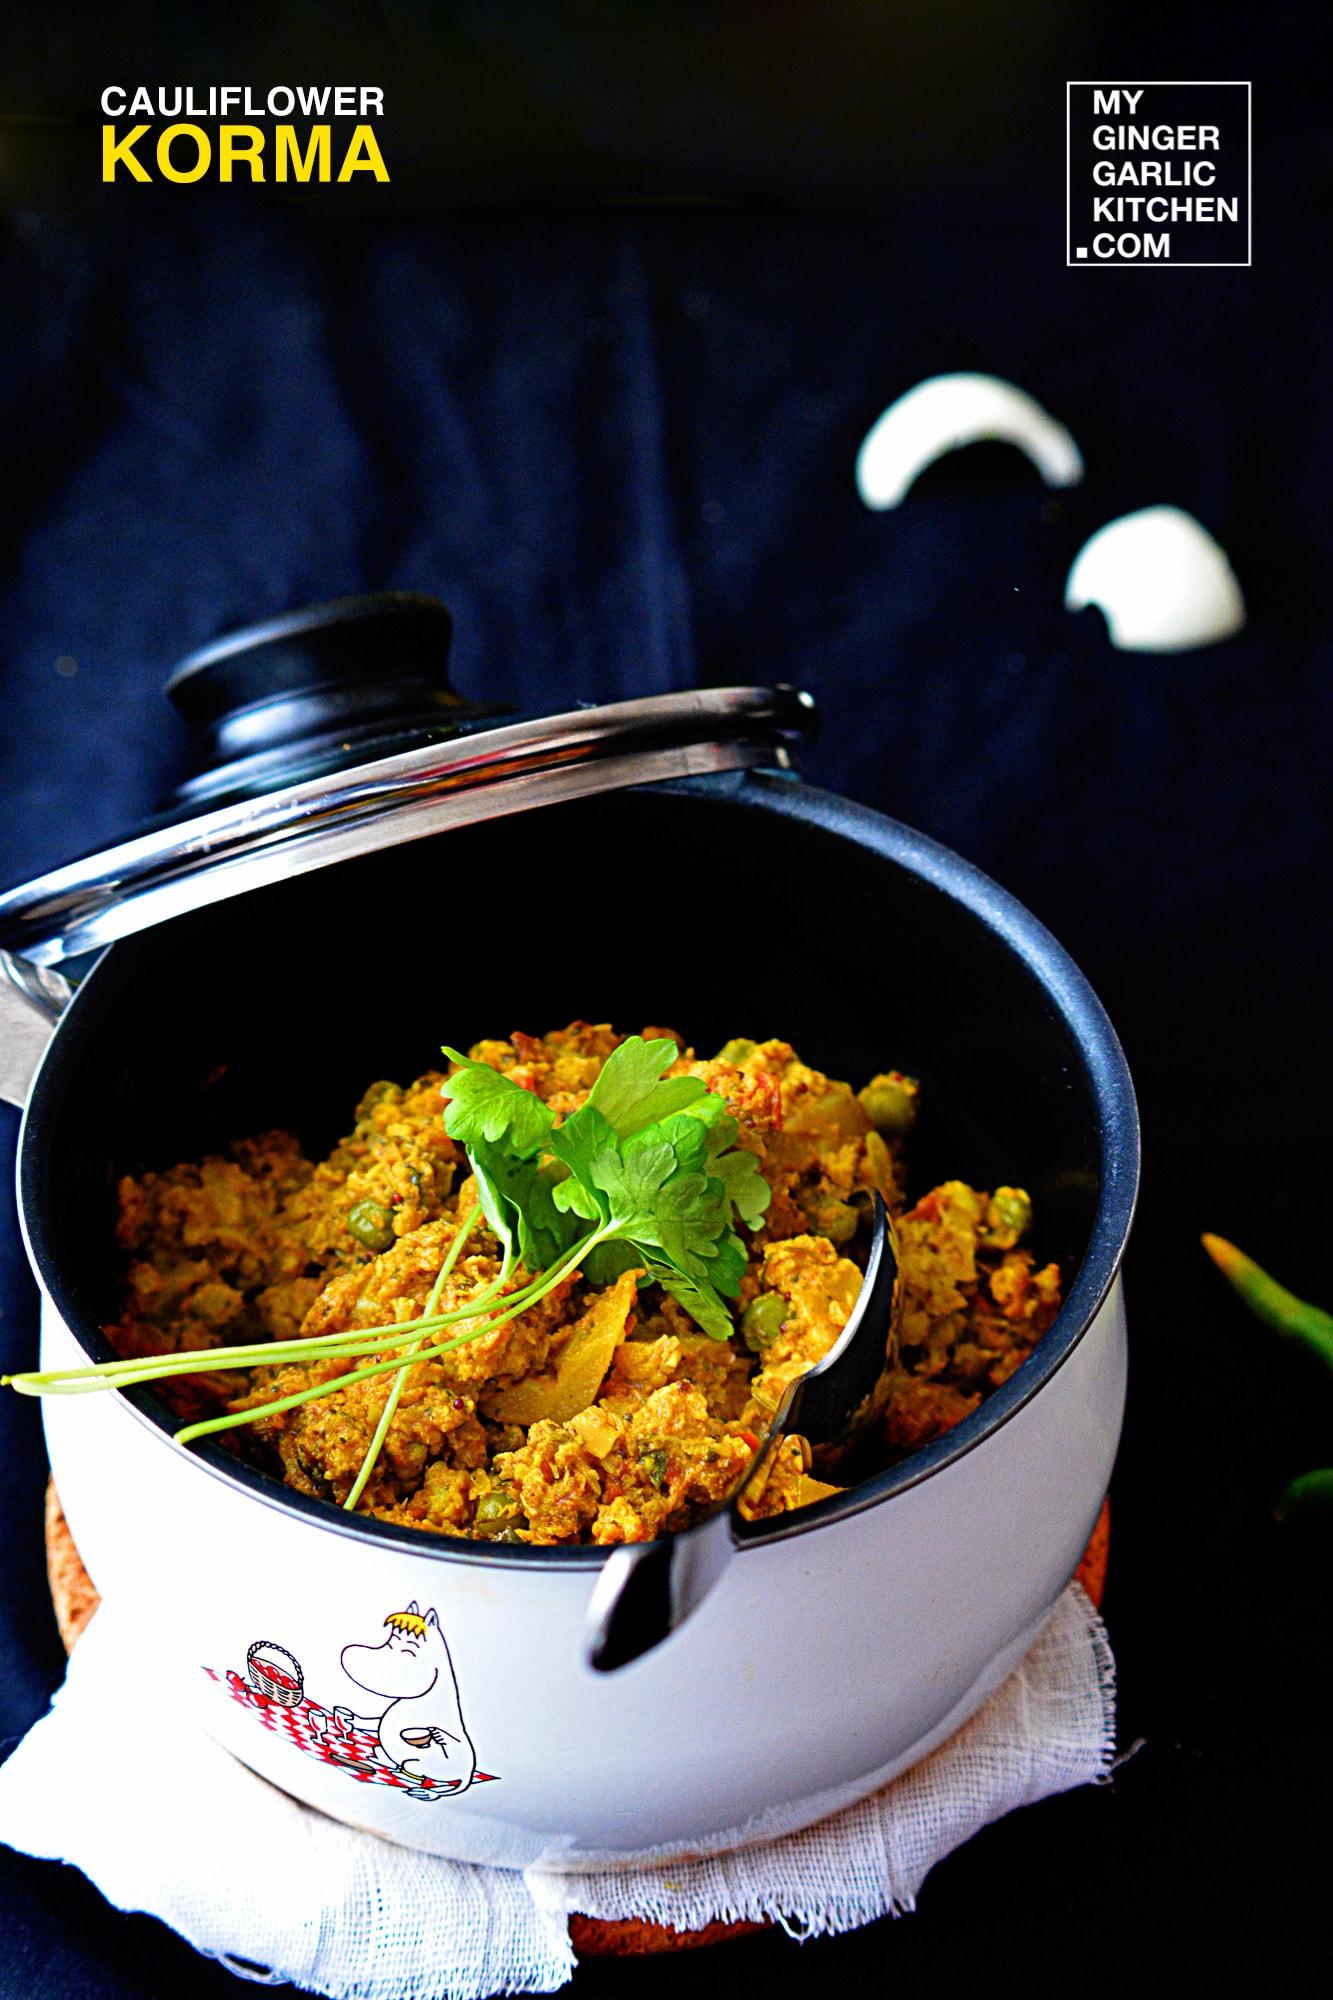 Image - recipe tantalizing cauliflower korma anupama paliwal my ginger garlic kitchen 3